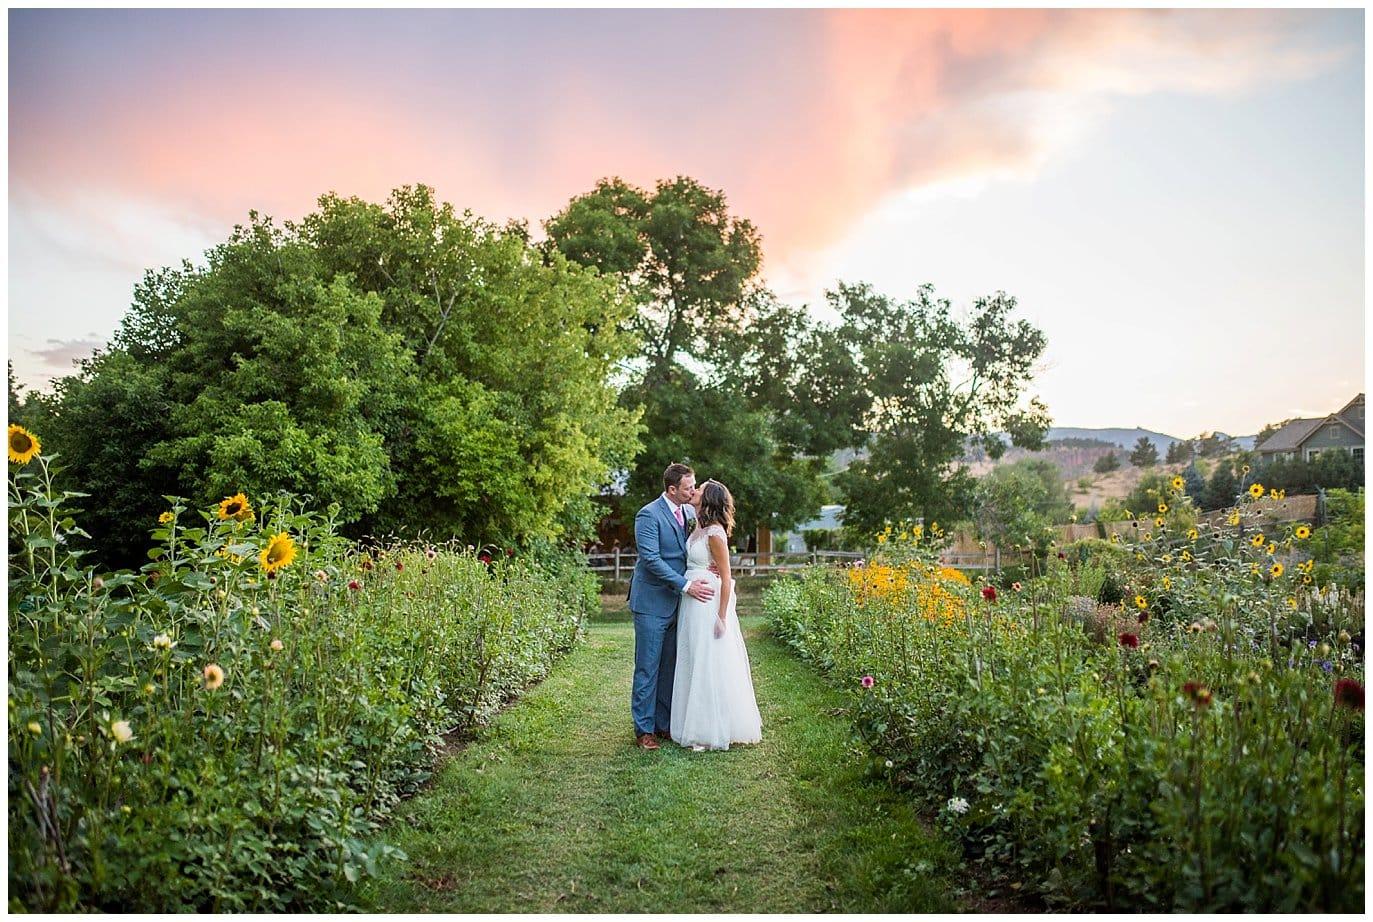 sunset photo at intimate Colorado wedding photo